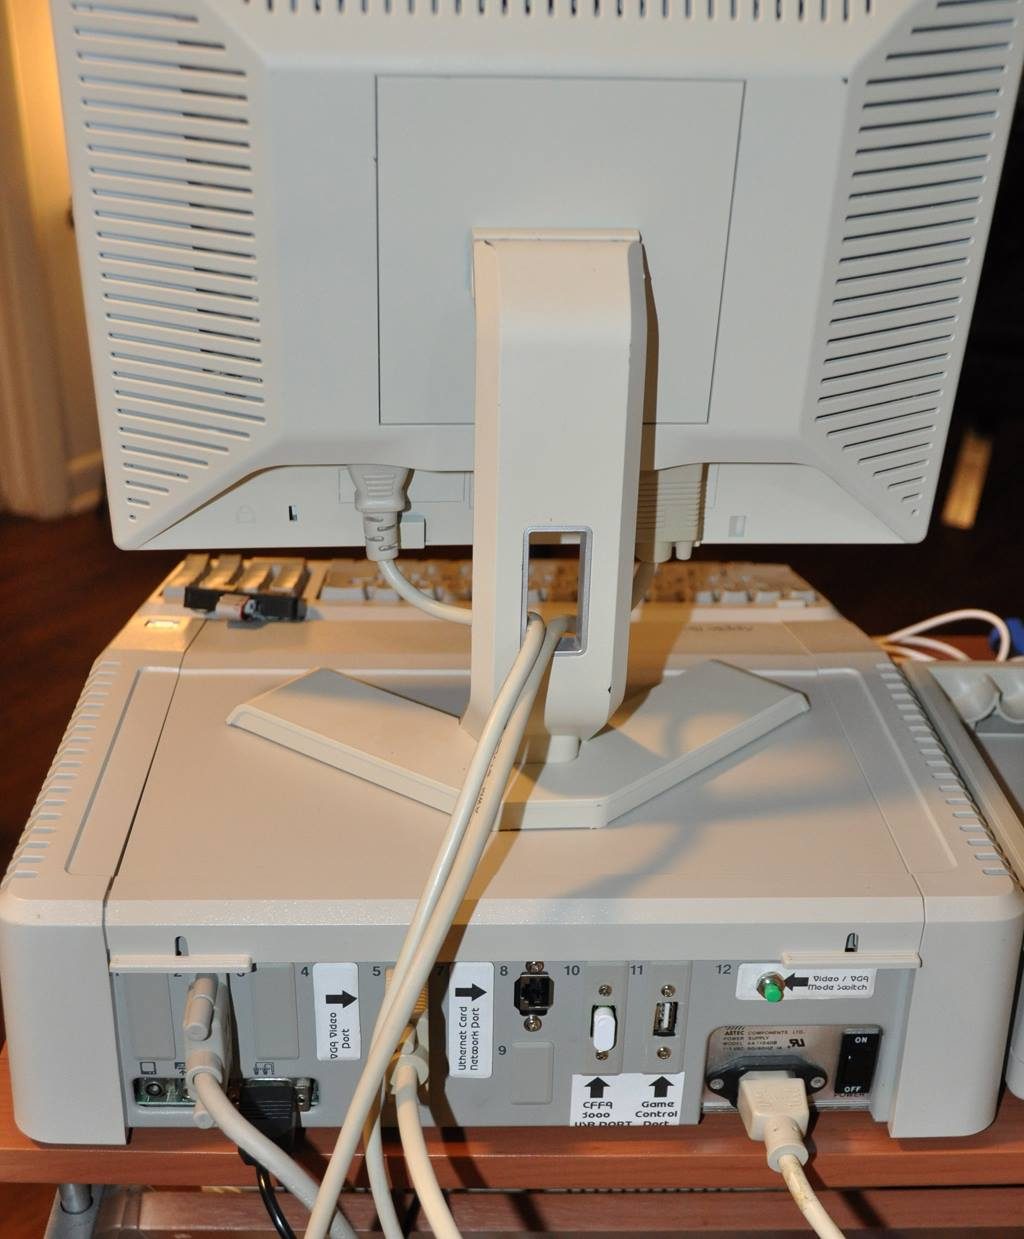 Apple //e rear ports labled